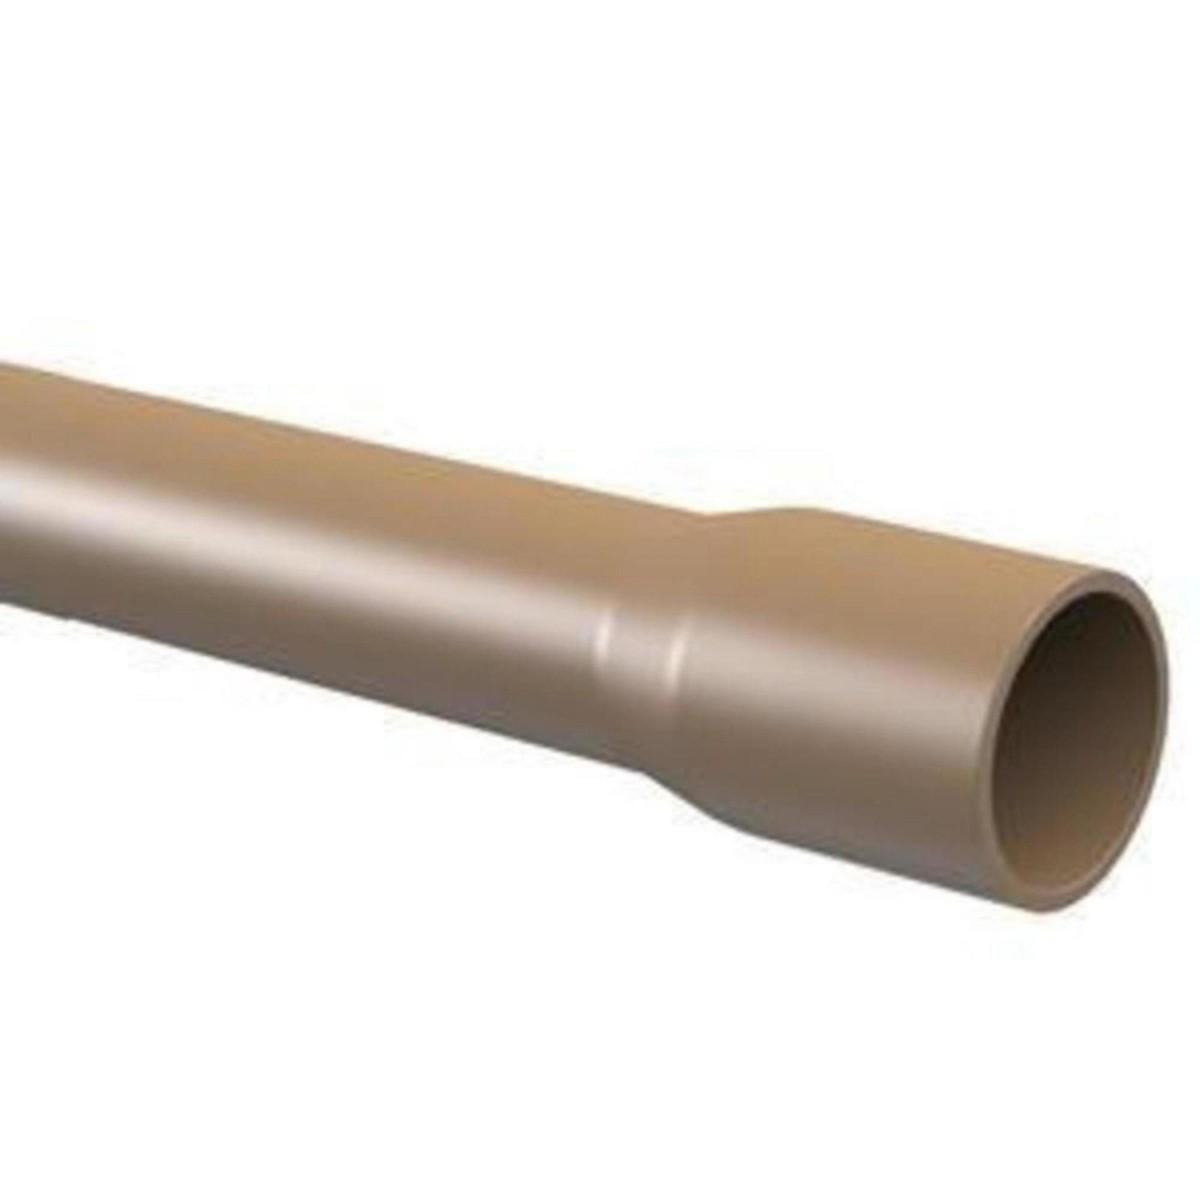 Solda Tubo 32mm (1